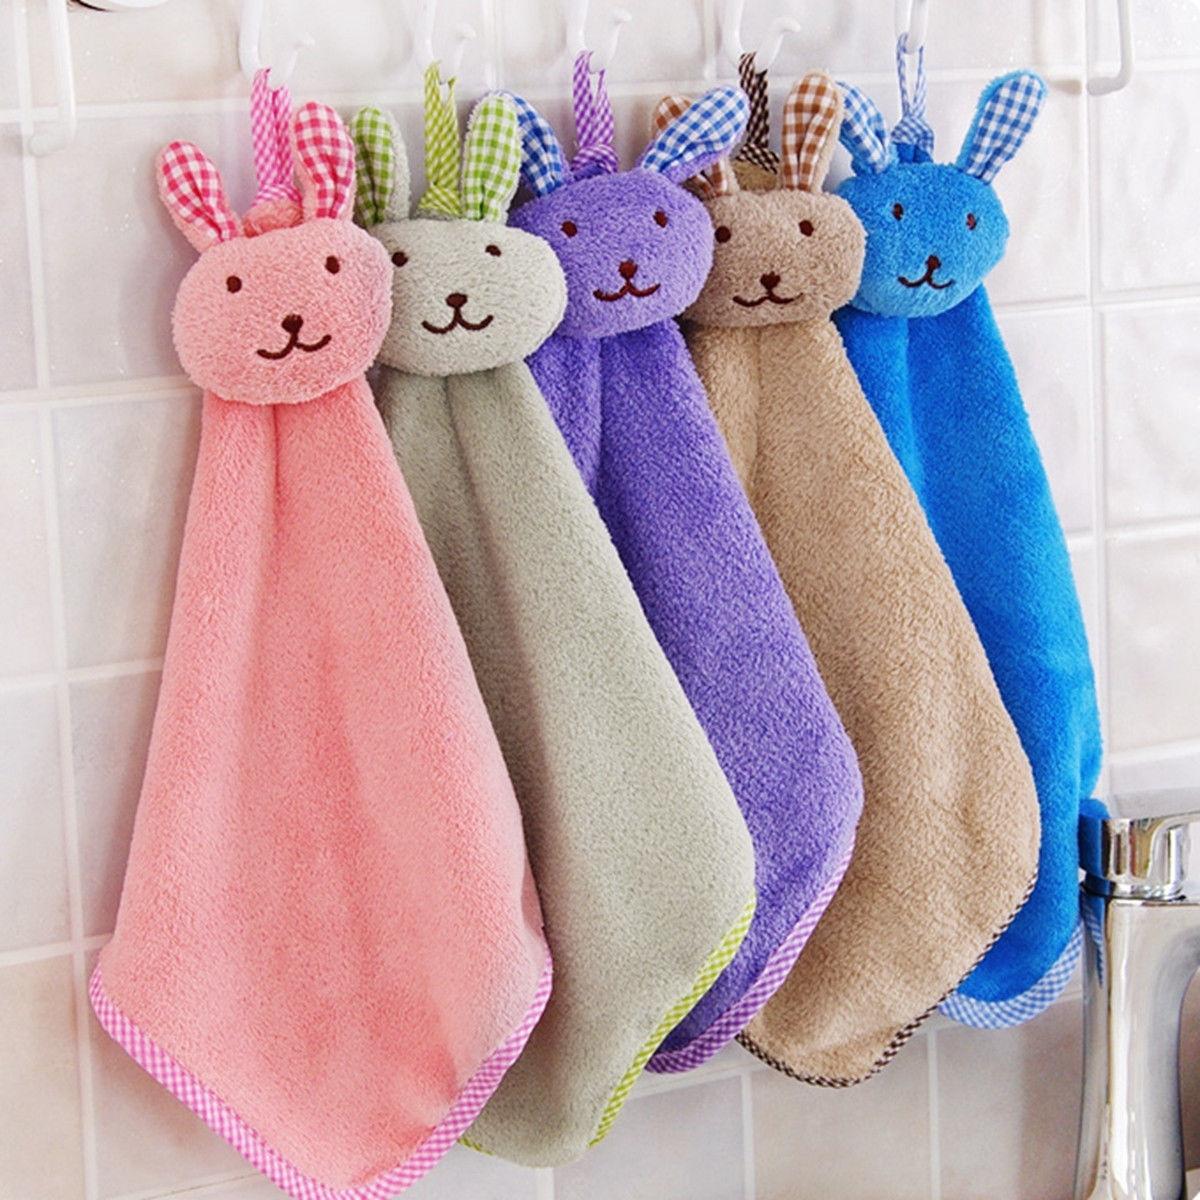 Picture of Baby Hand Towel Cartoon Animal Rabbit Plush Kitchen Soft Hanging Bath Wipe Towel